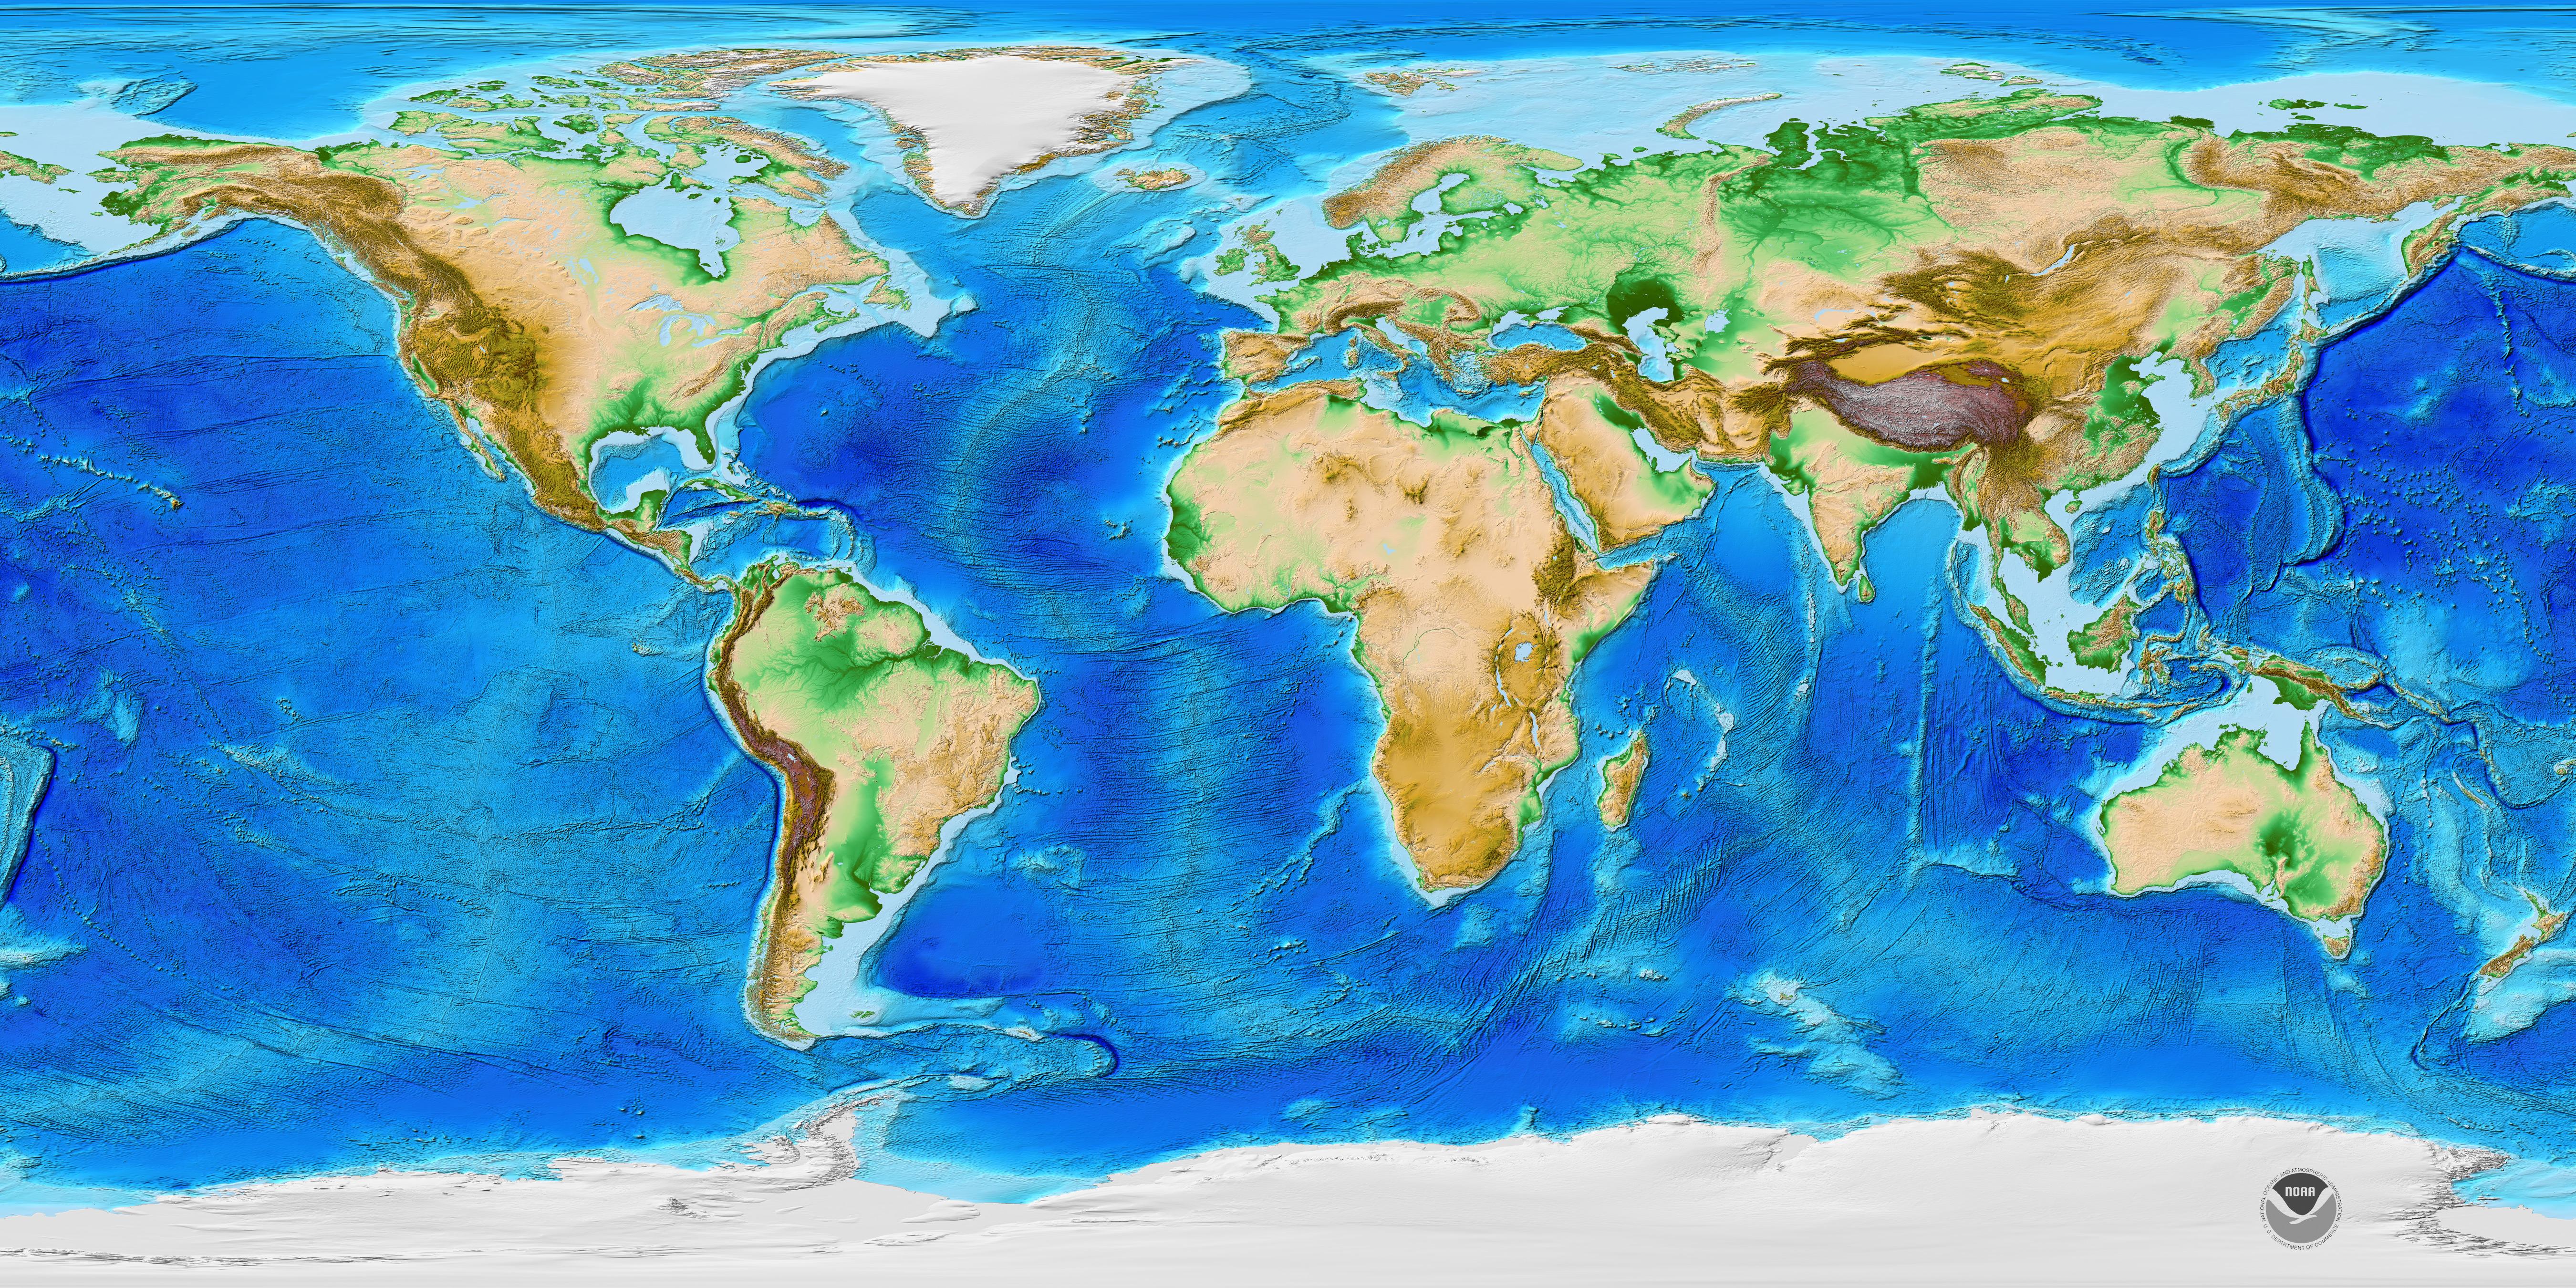 Global Topography And Tectonic Plates